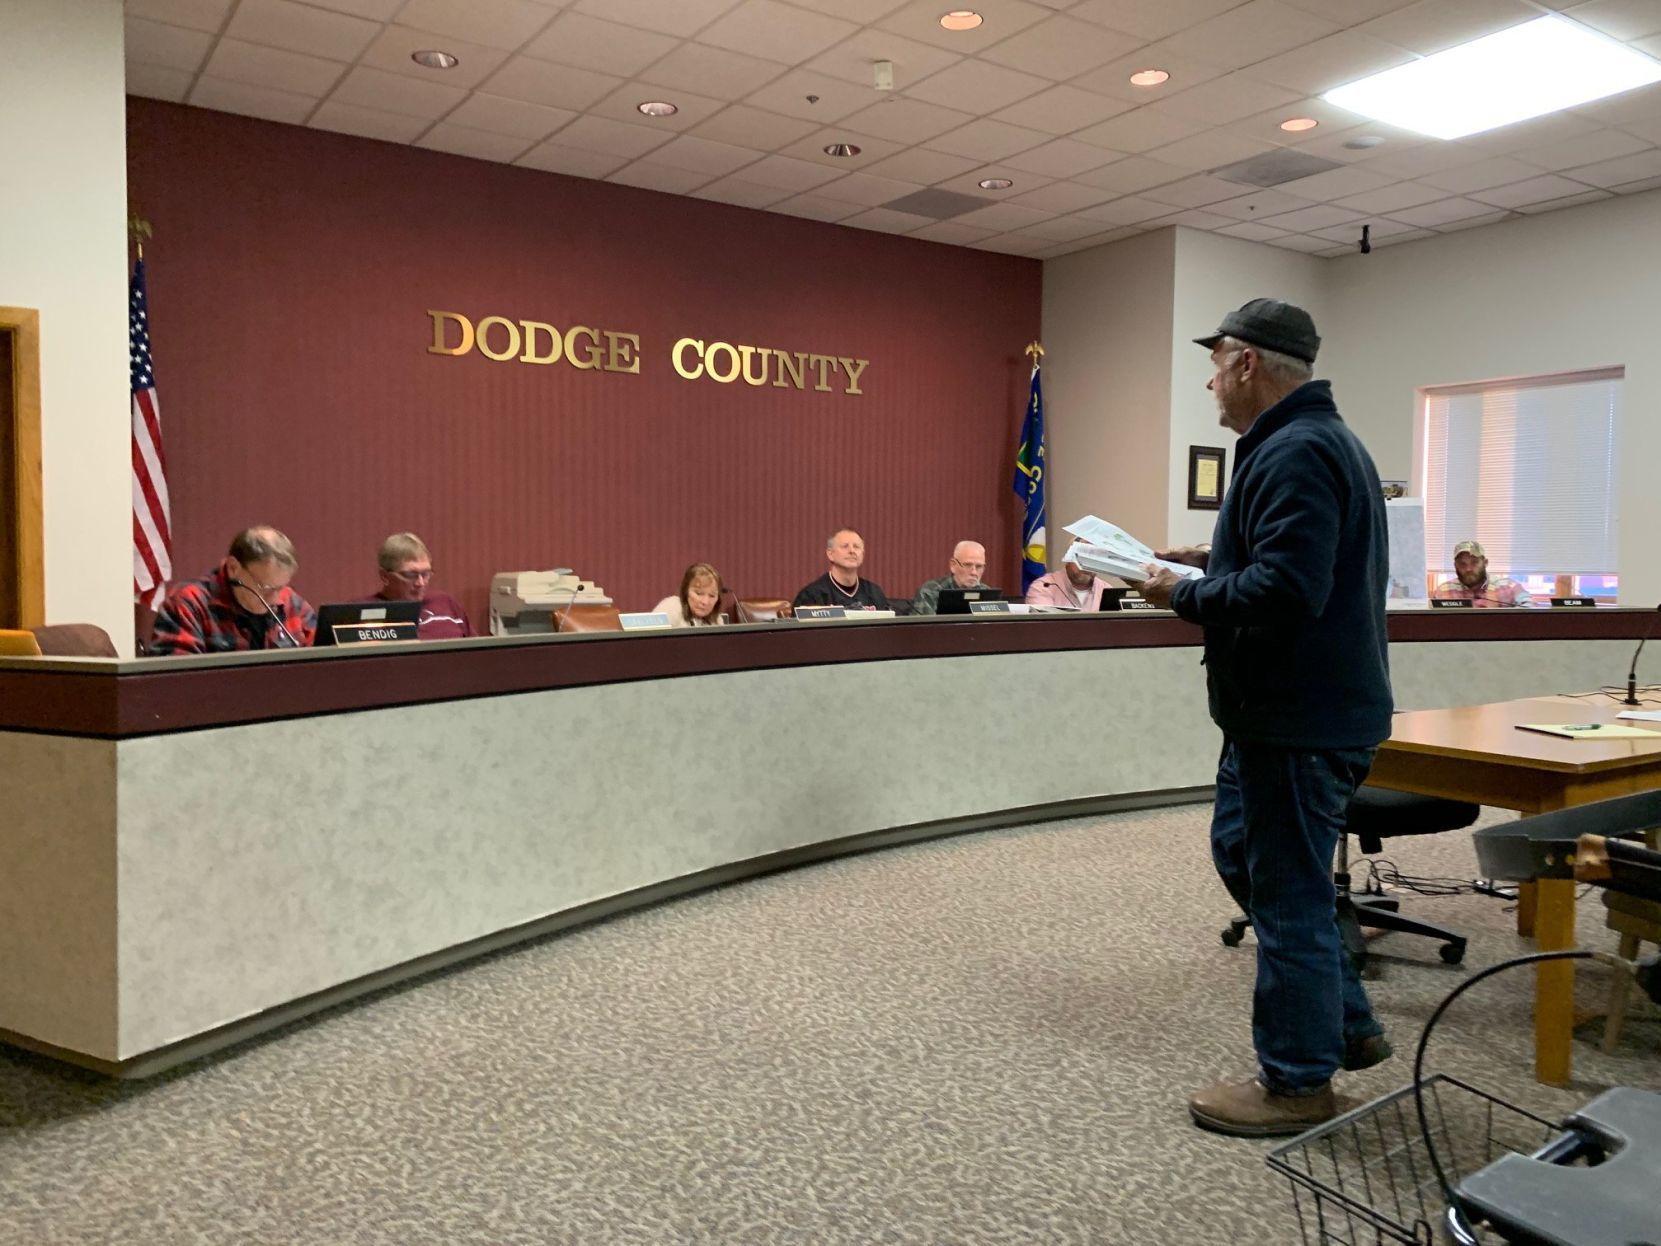 Dodge County chicken farm vote: Speak now or forever hold your beak